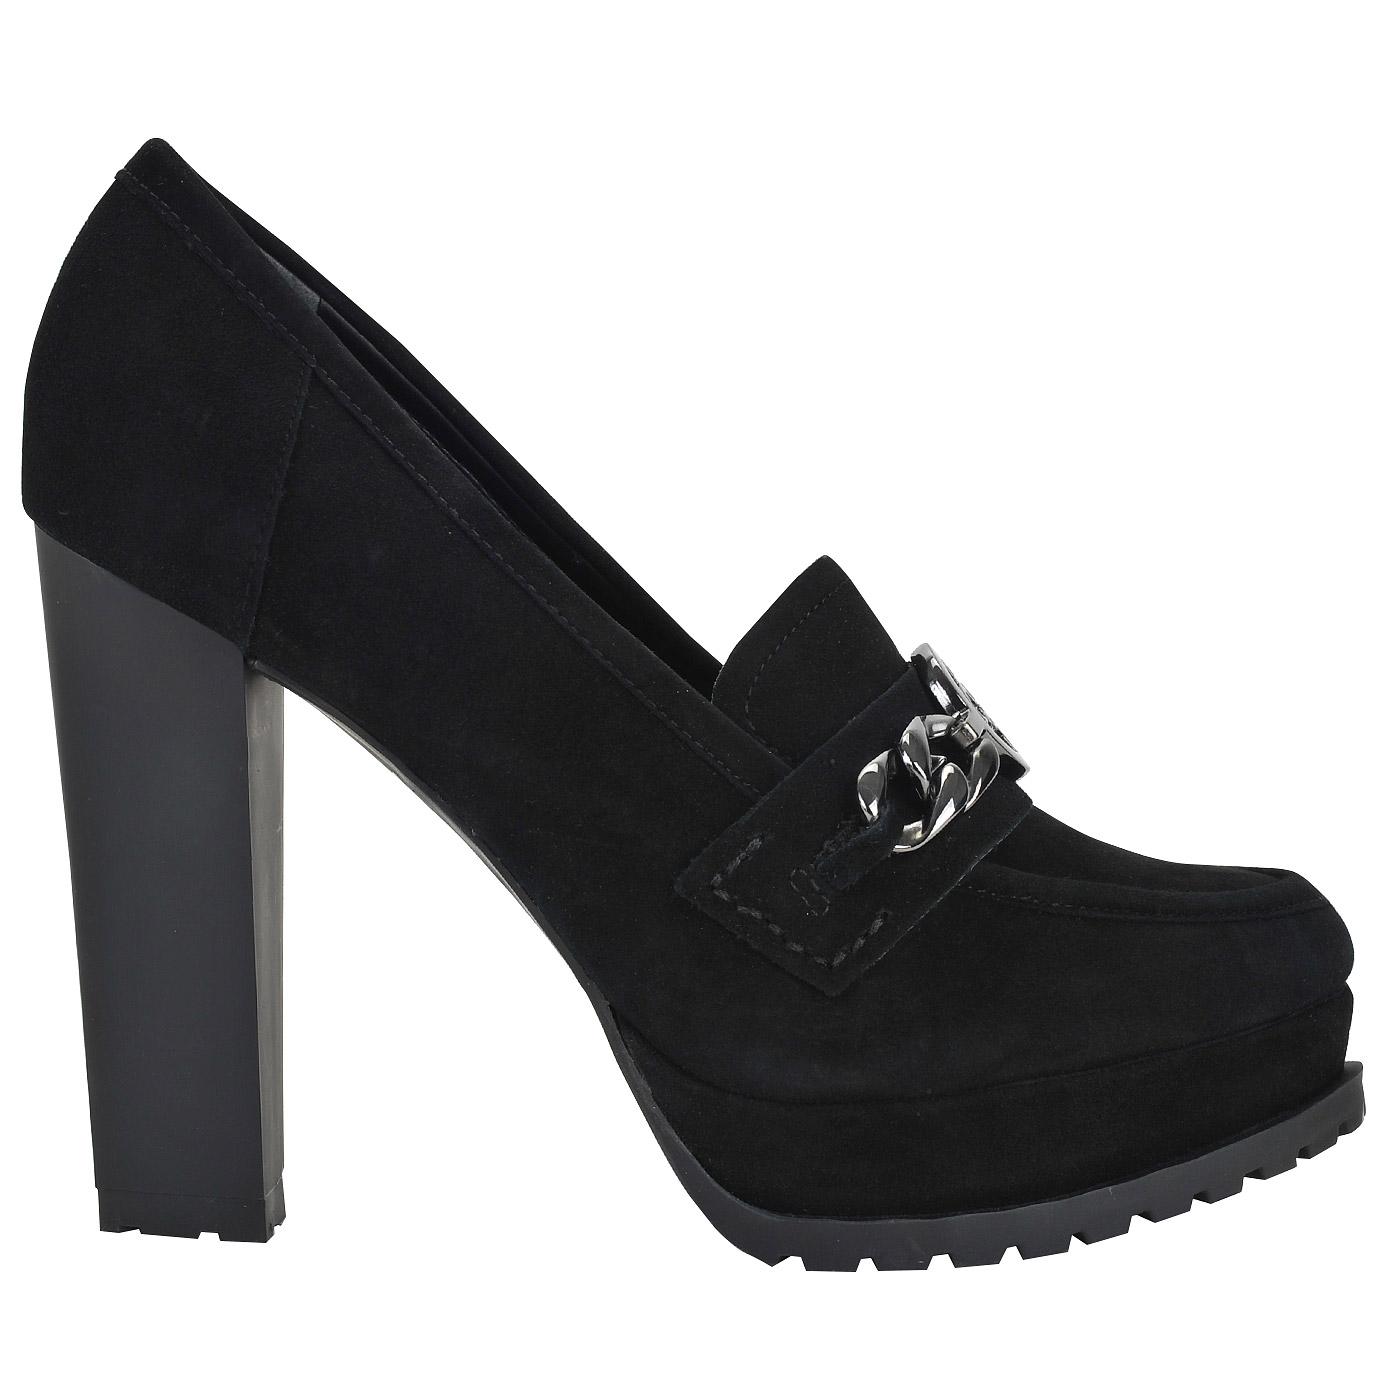 130f378f2 Женские замшевые туфли на устойчивом каблуке Guess Rinnie FLRNN3 ...